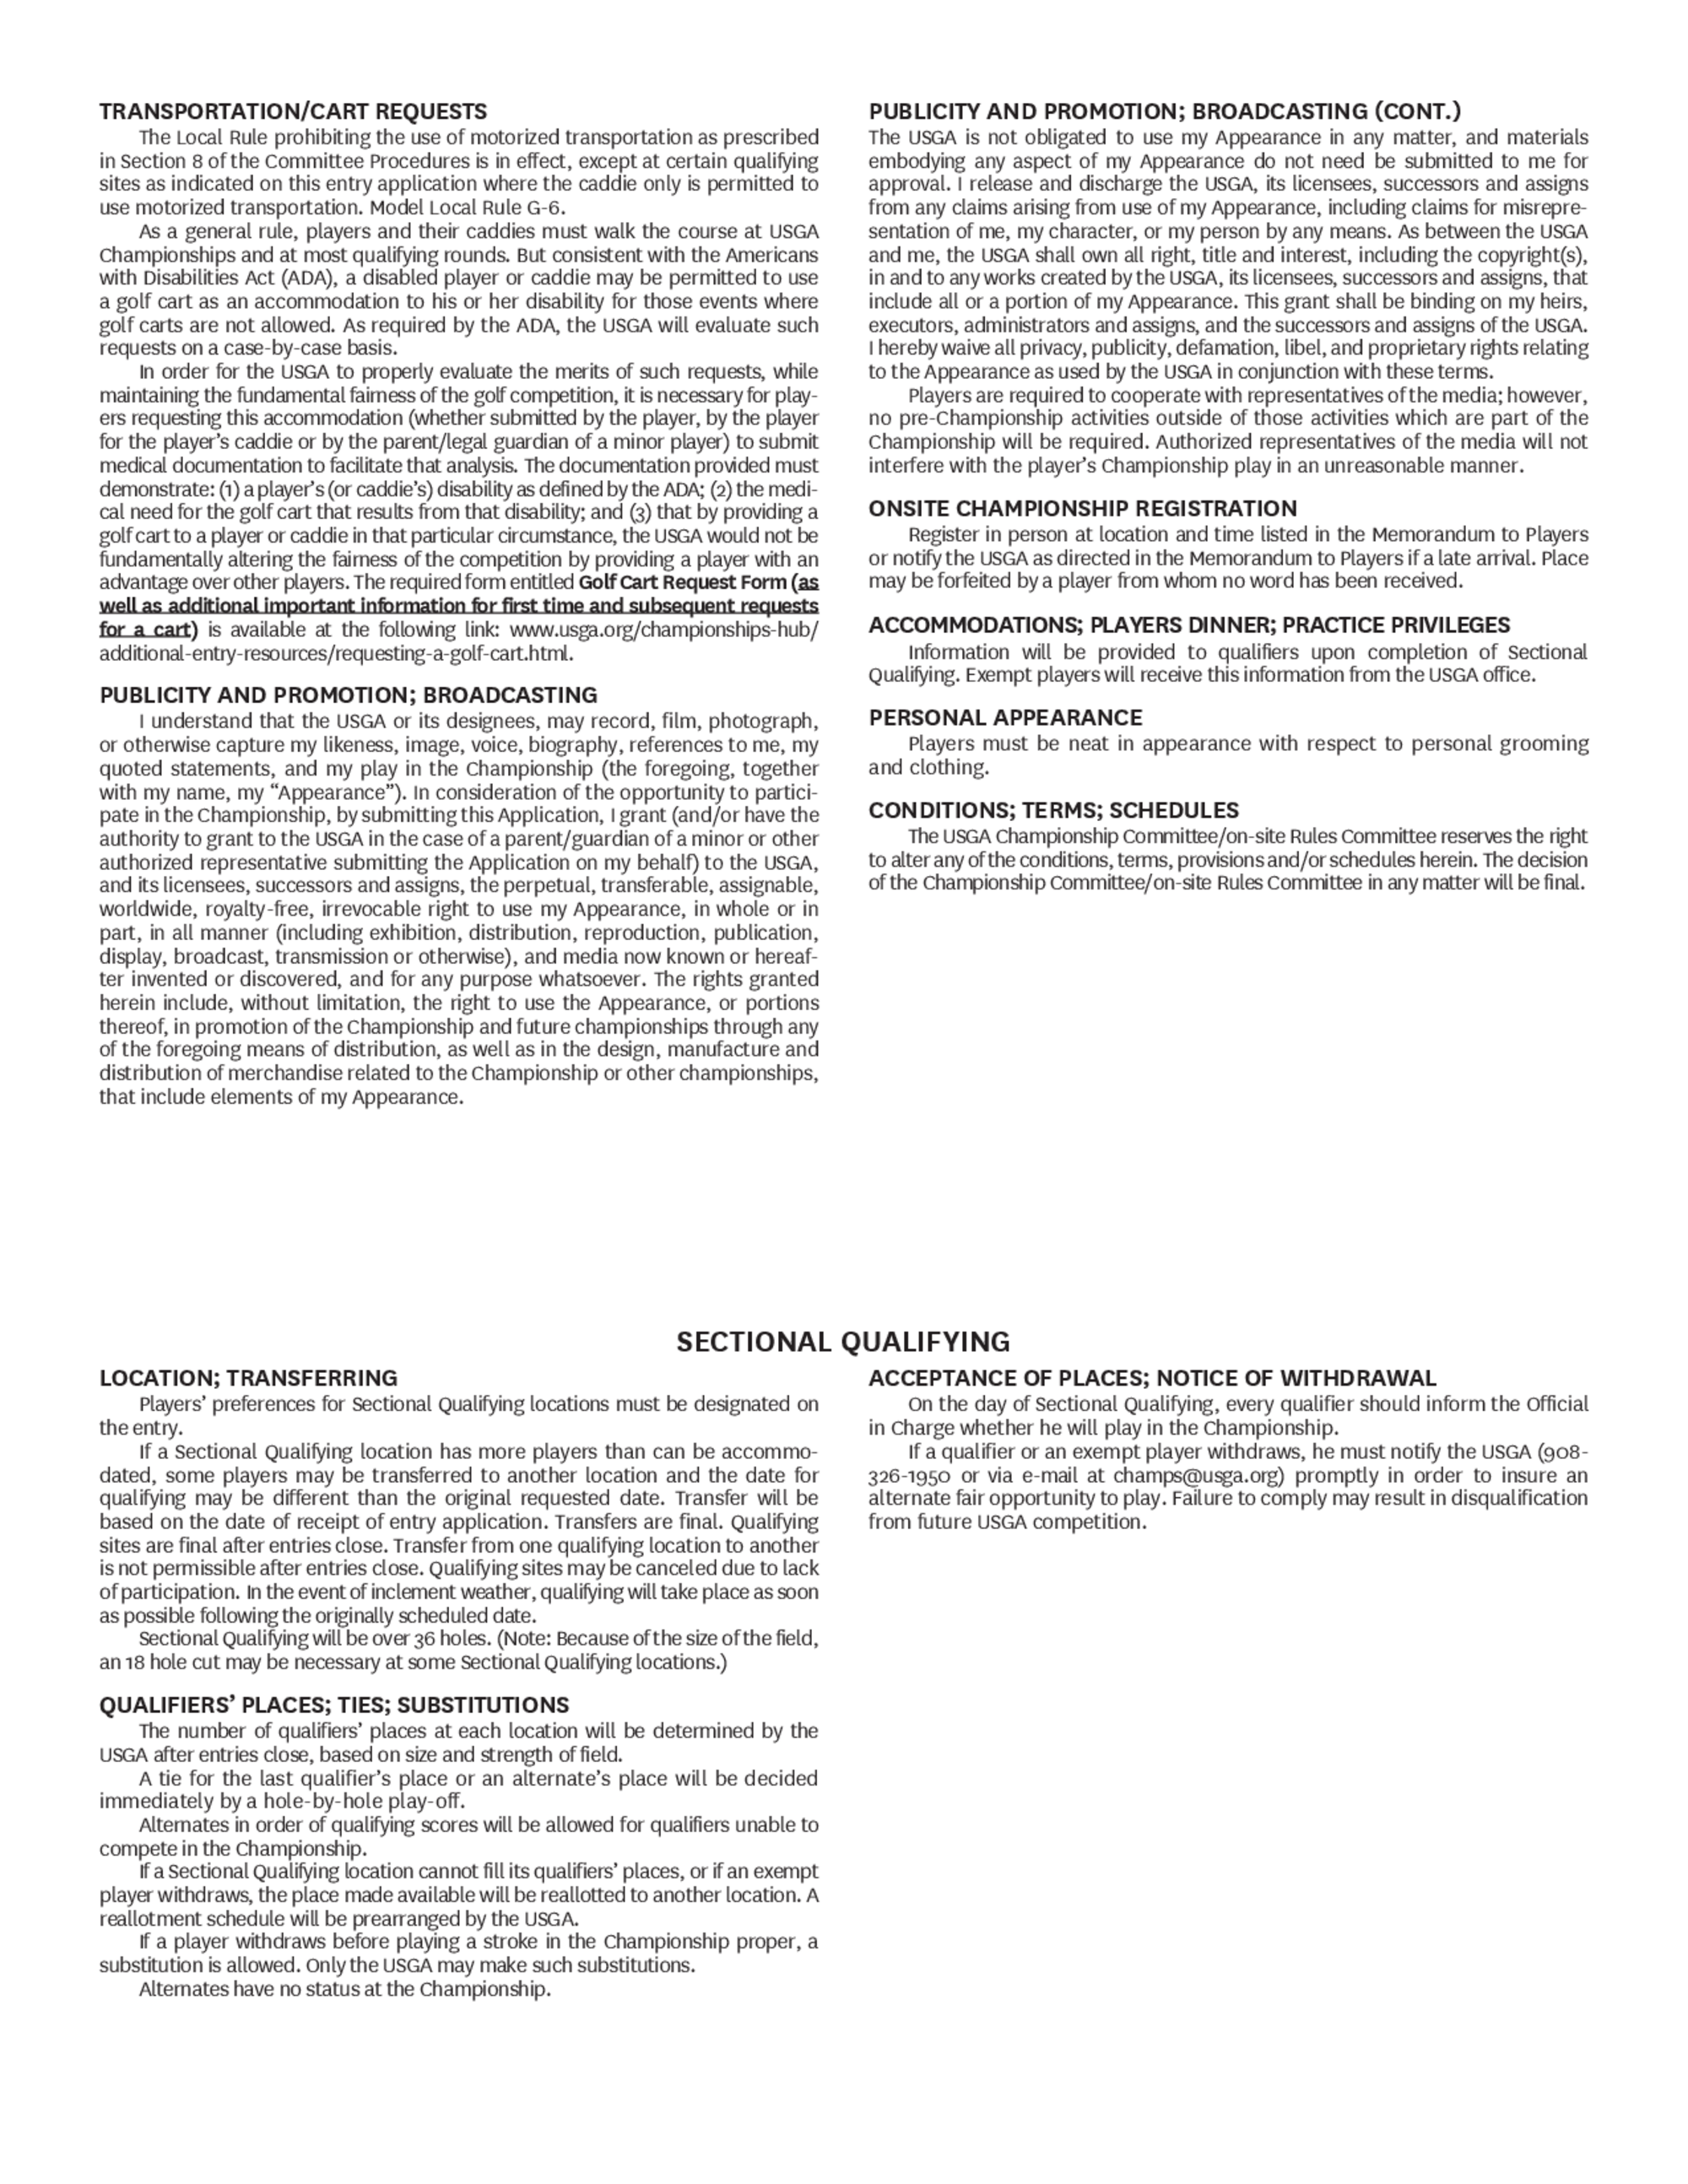 2019 u.s. amateur pdf 2